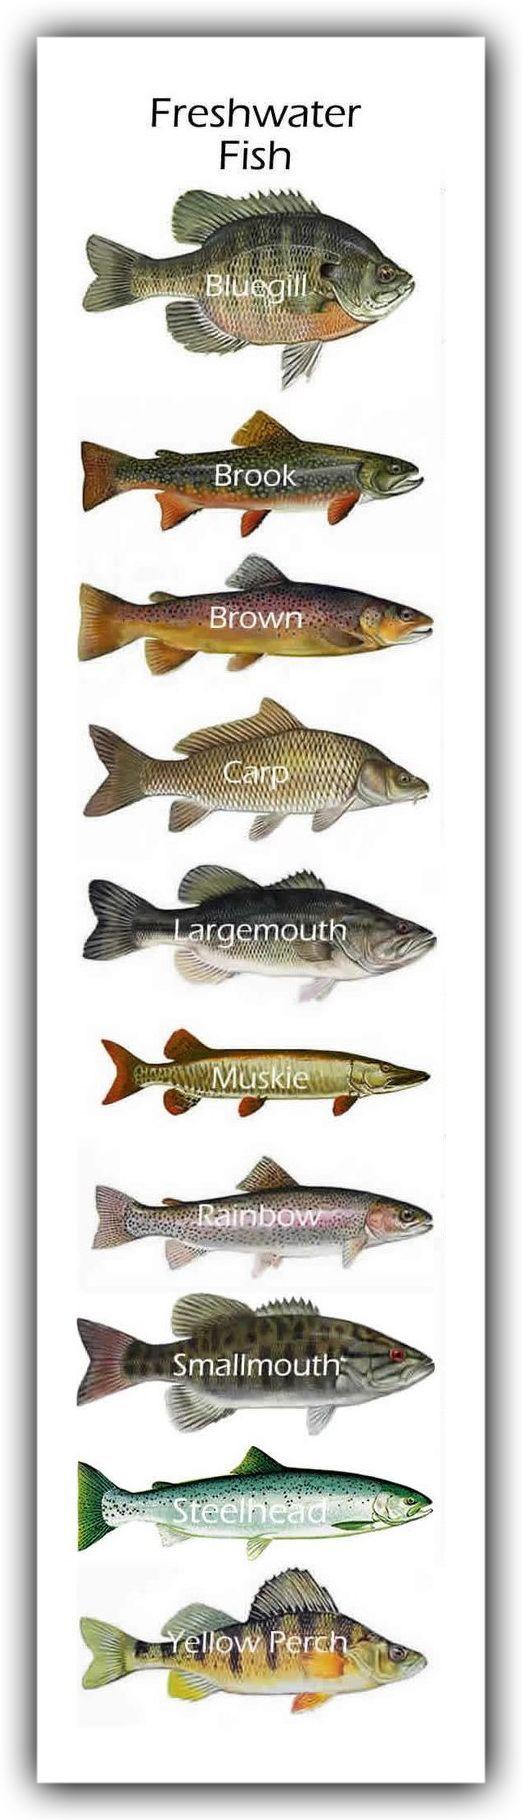 cool Freshwater Fish... by http://www.dezdemon-exoticfish.space/fishing-tips/freshwater-fish/